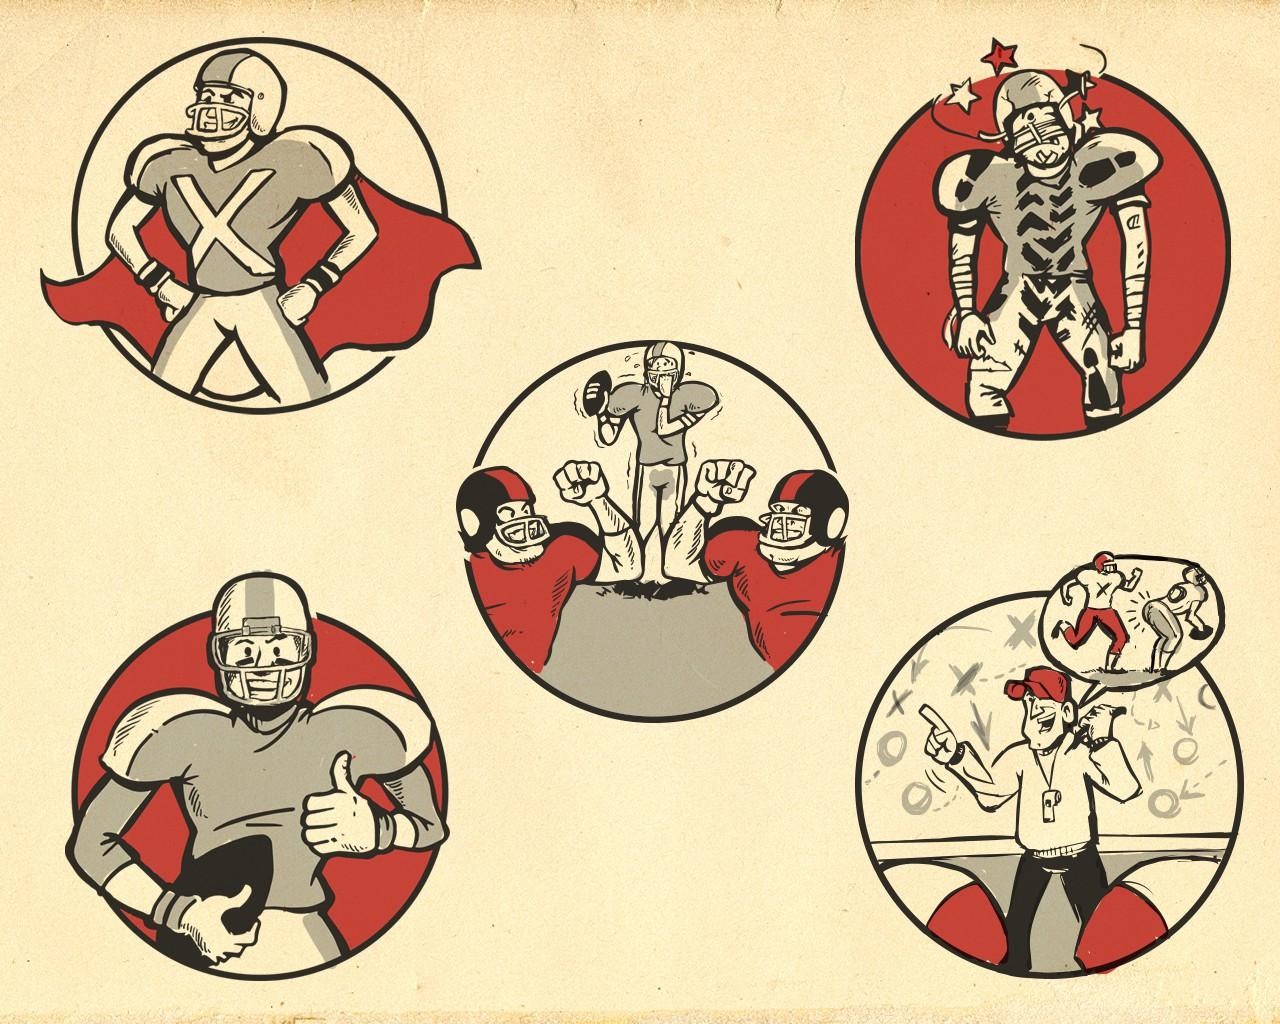 Create vintage football card cartoon icons for Gridiron View